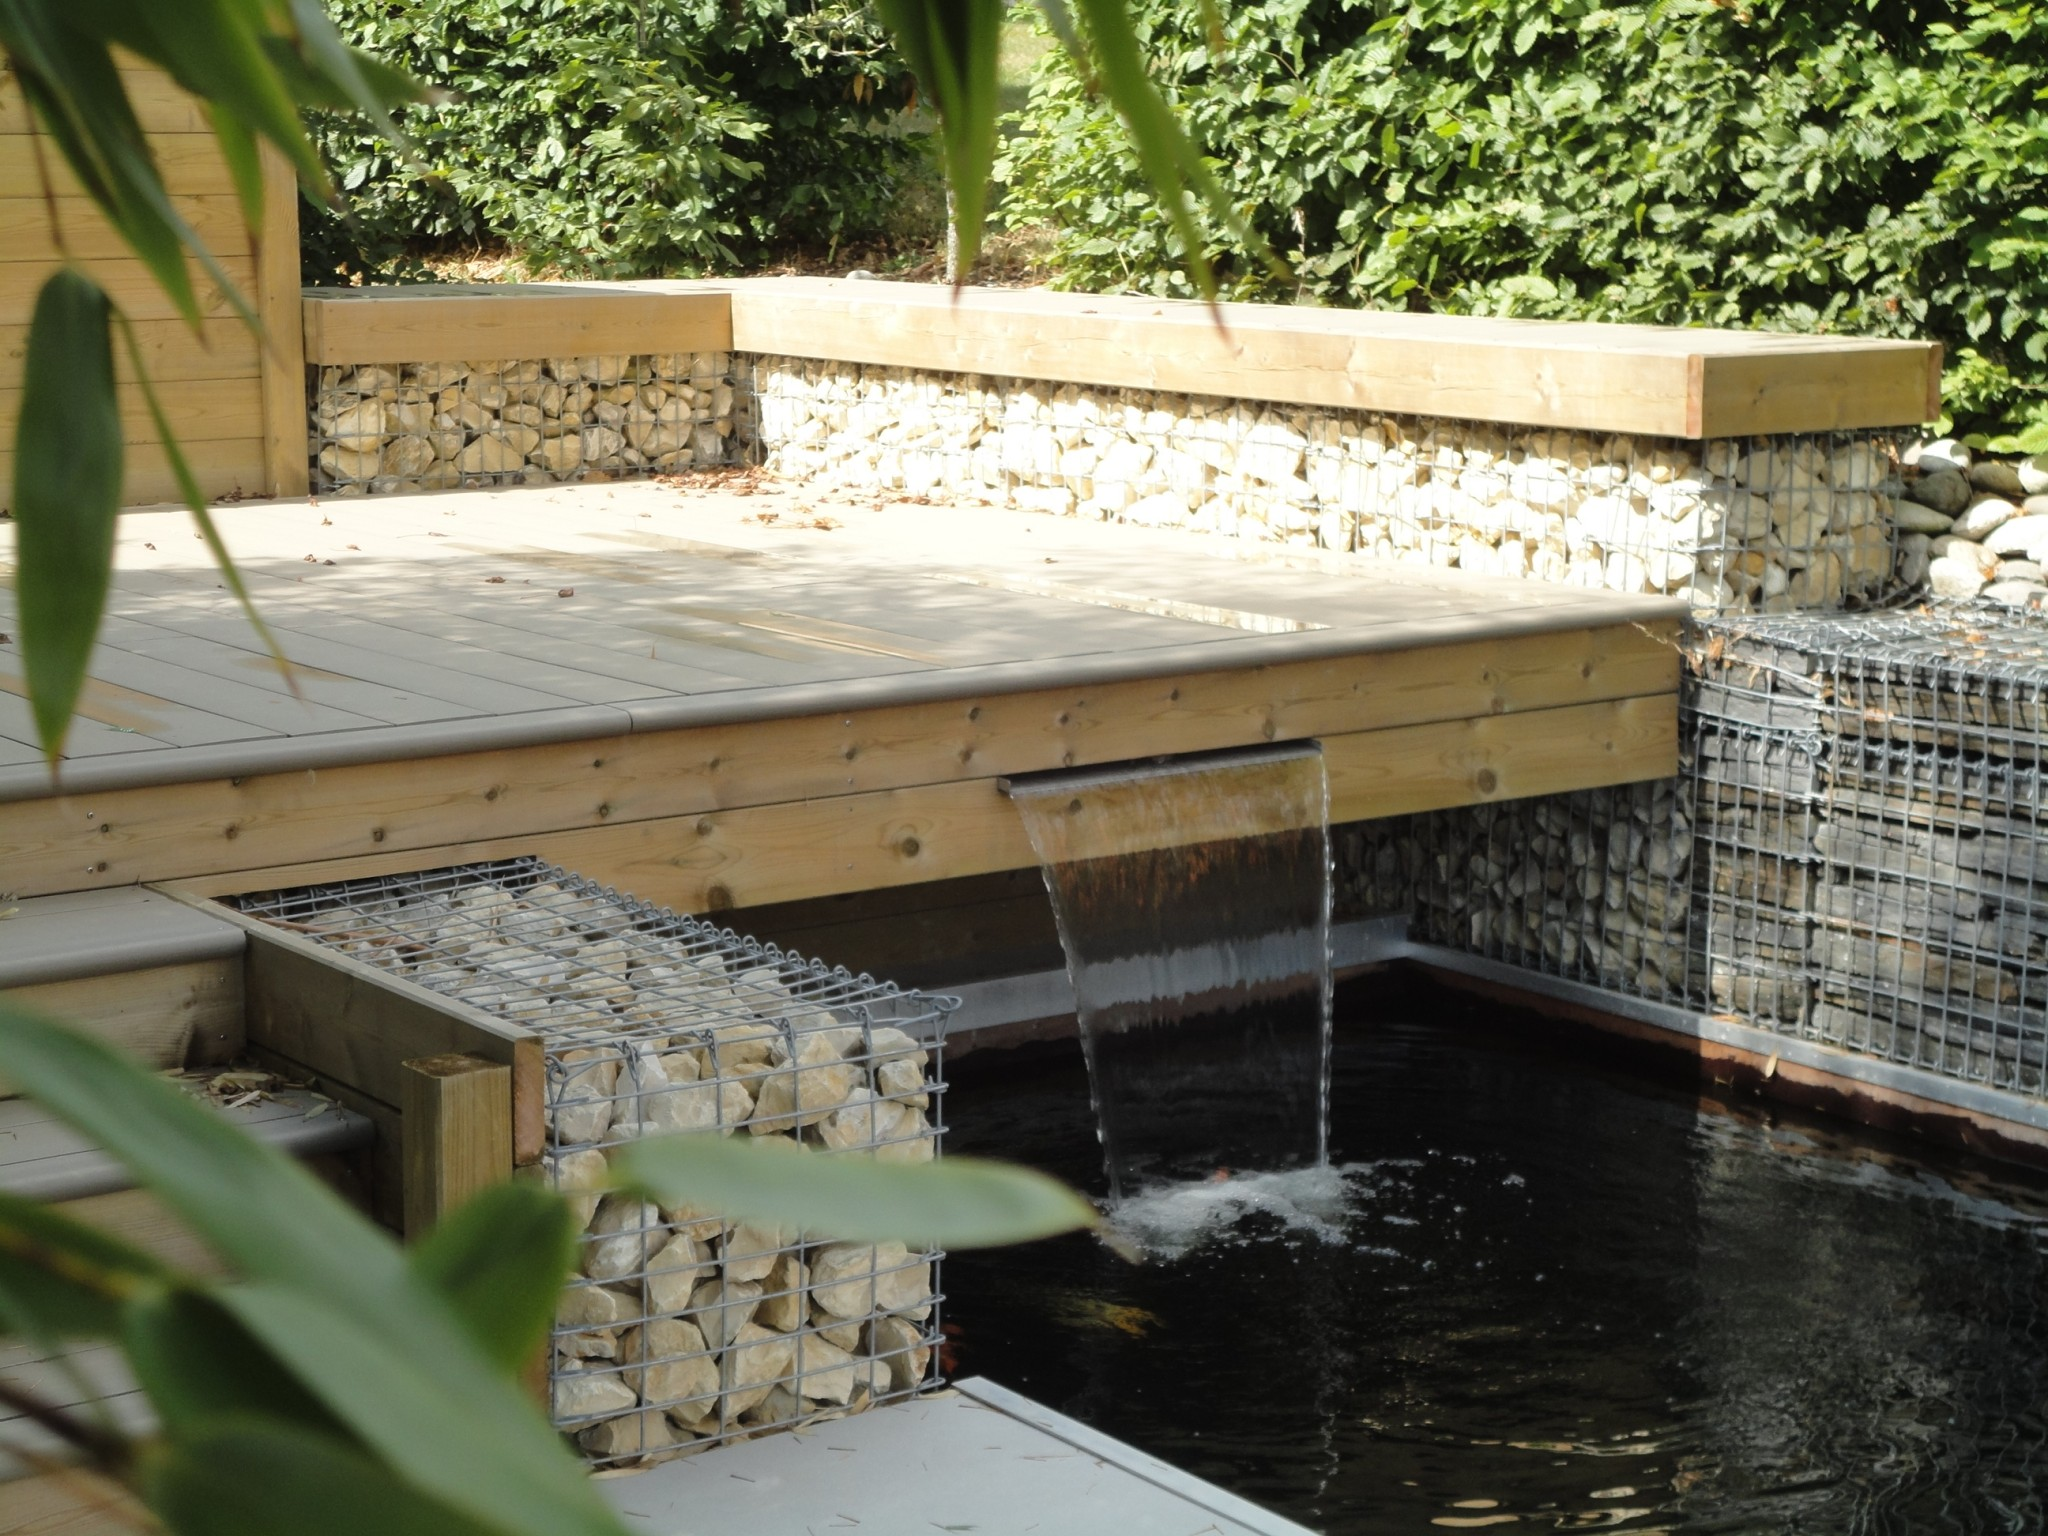 Notre jardin d 39 exposition permanente rebeyrol - Bassin terrasse bois ...